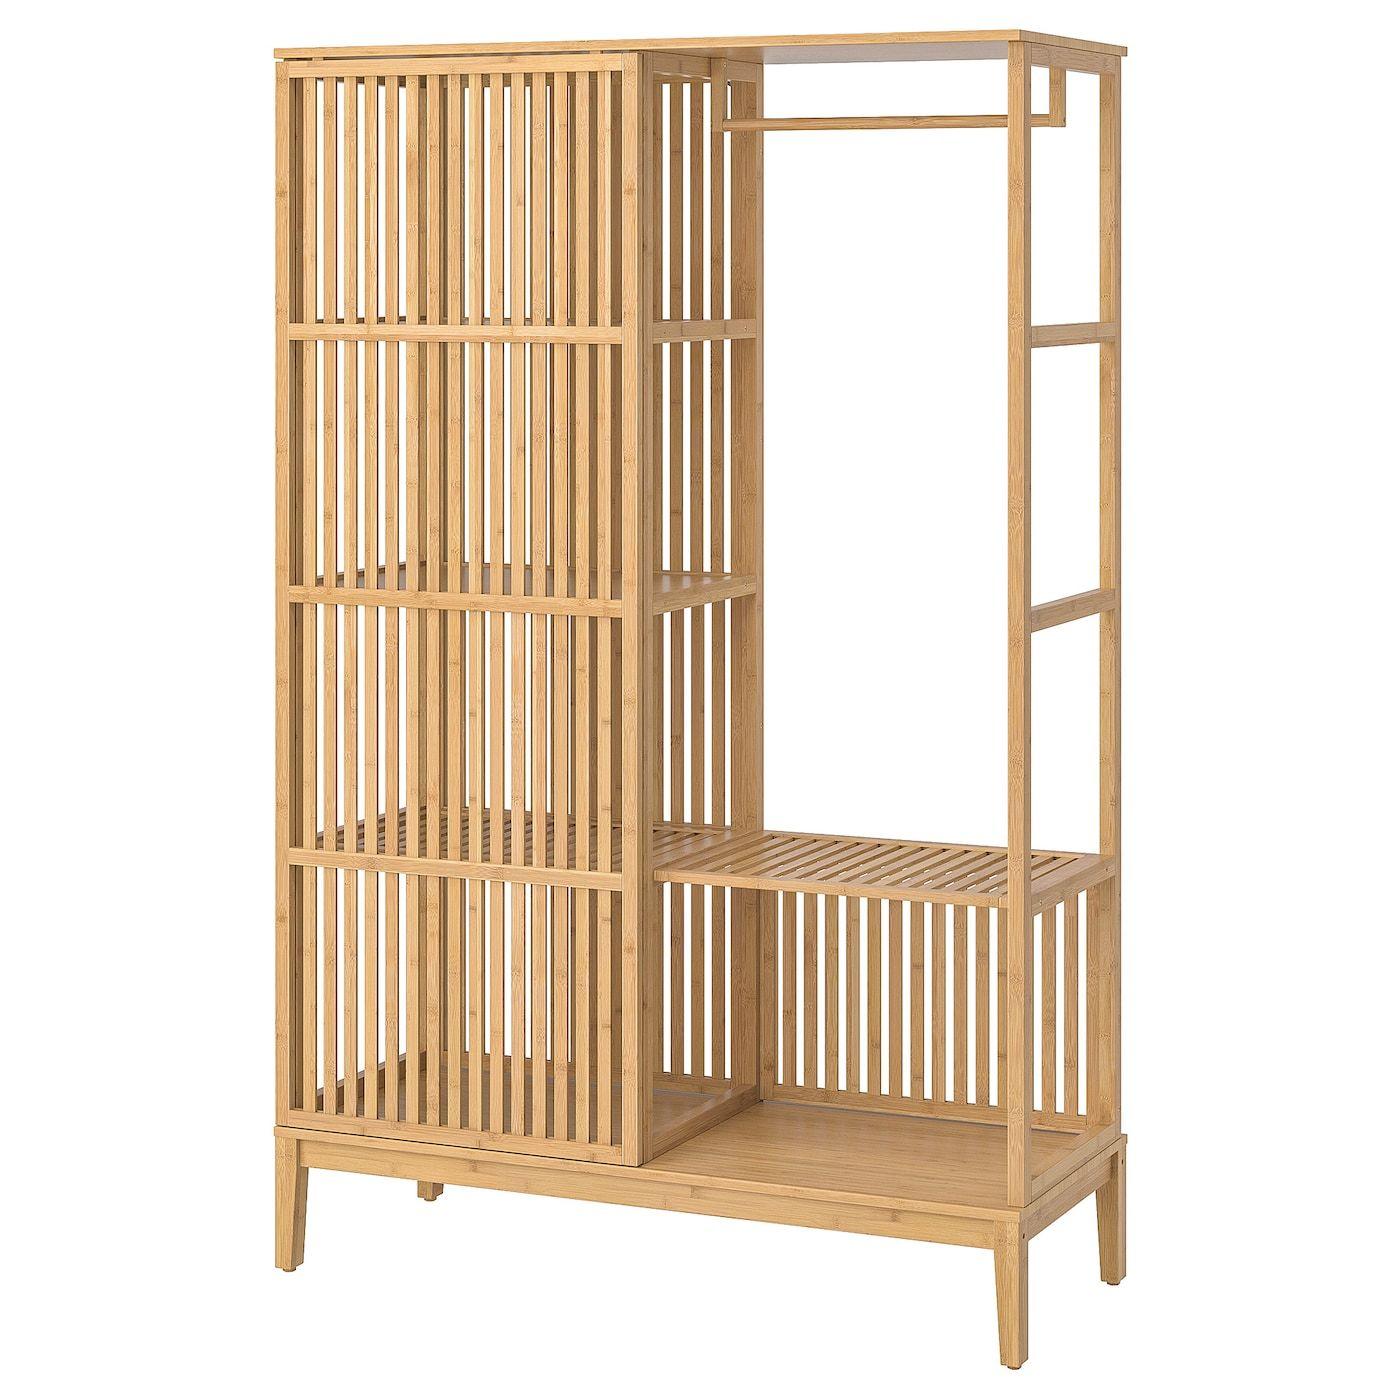 Nordkisa Open Wardrobe With Sliding Door Bamboo 47 1 4x73 1 4